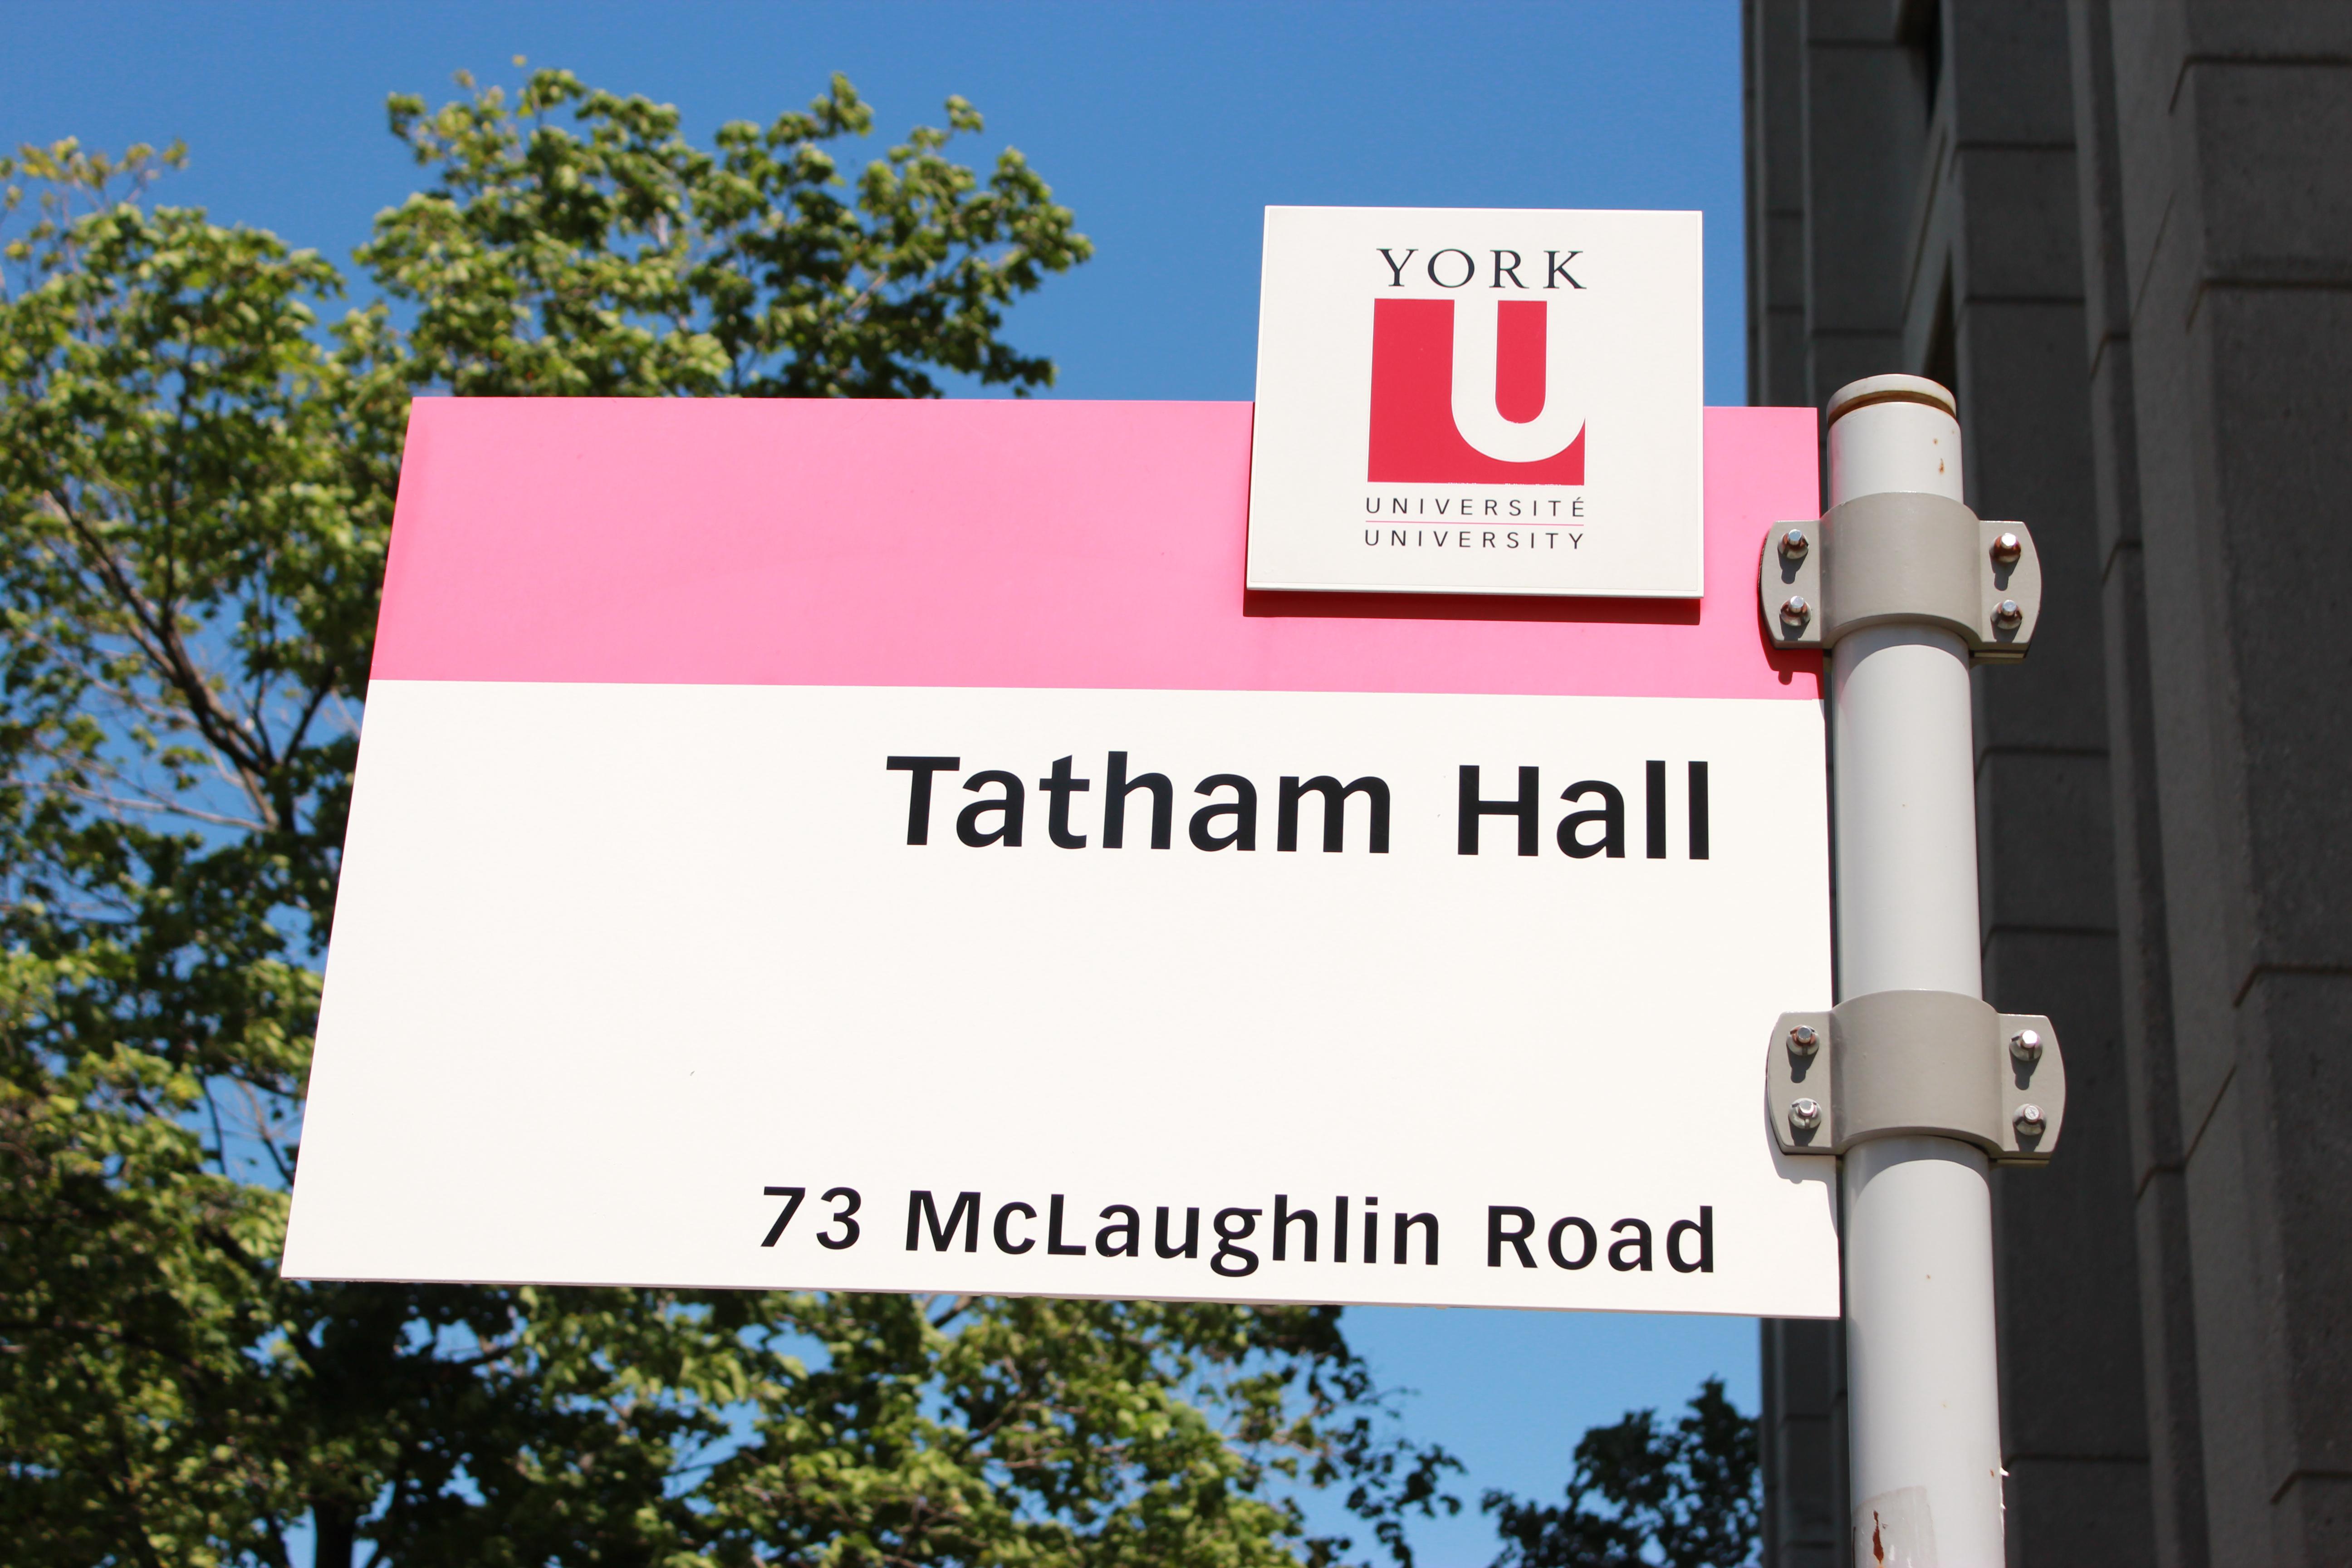 Tatham Hall sign